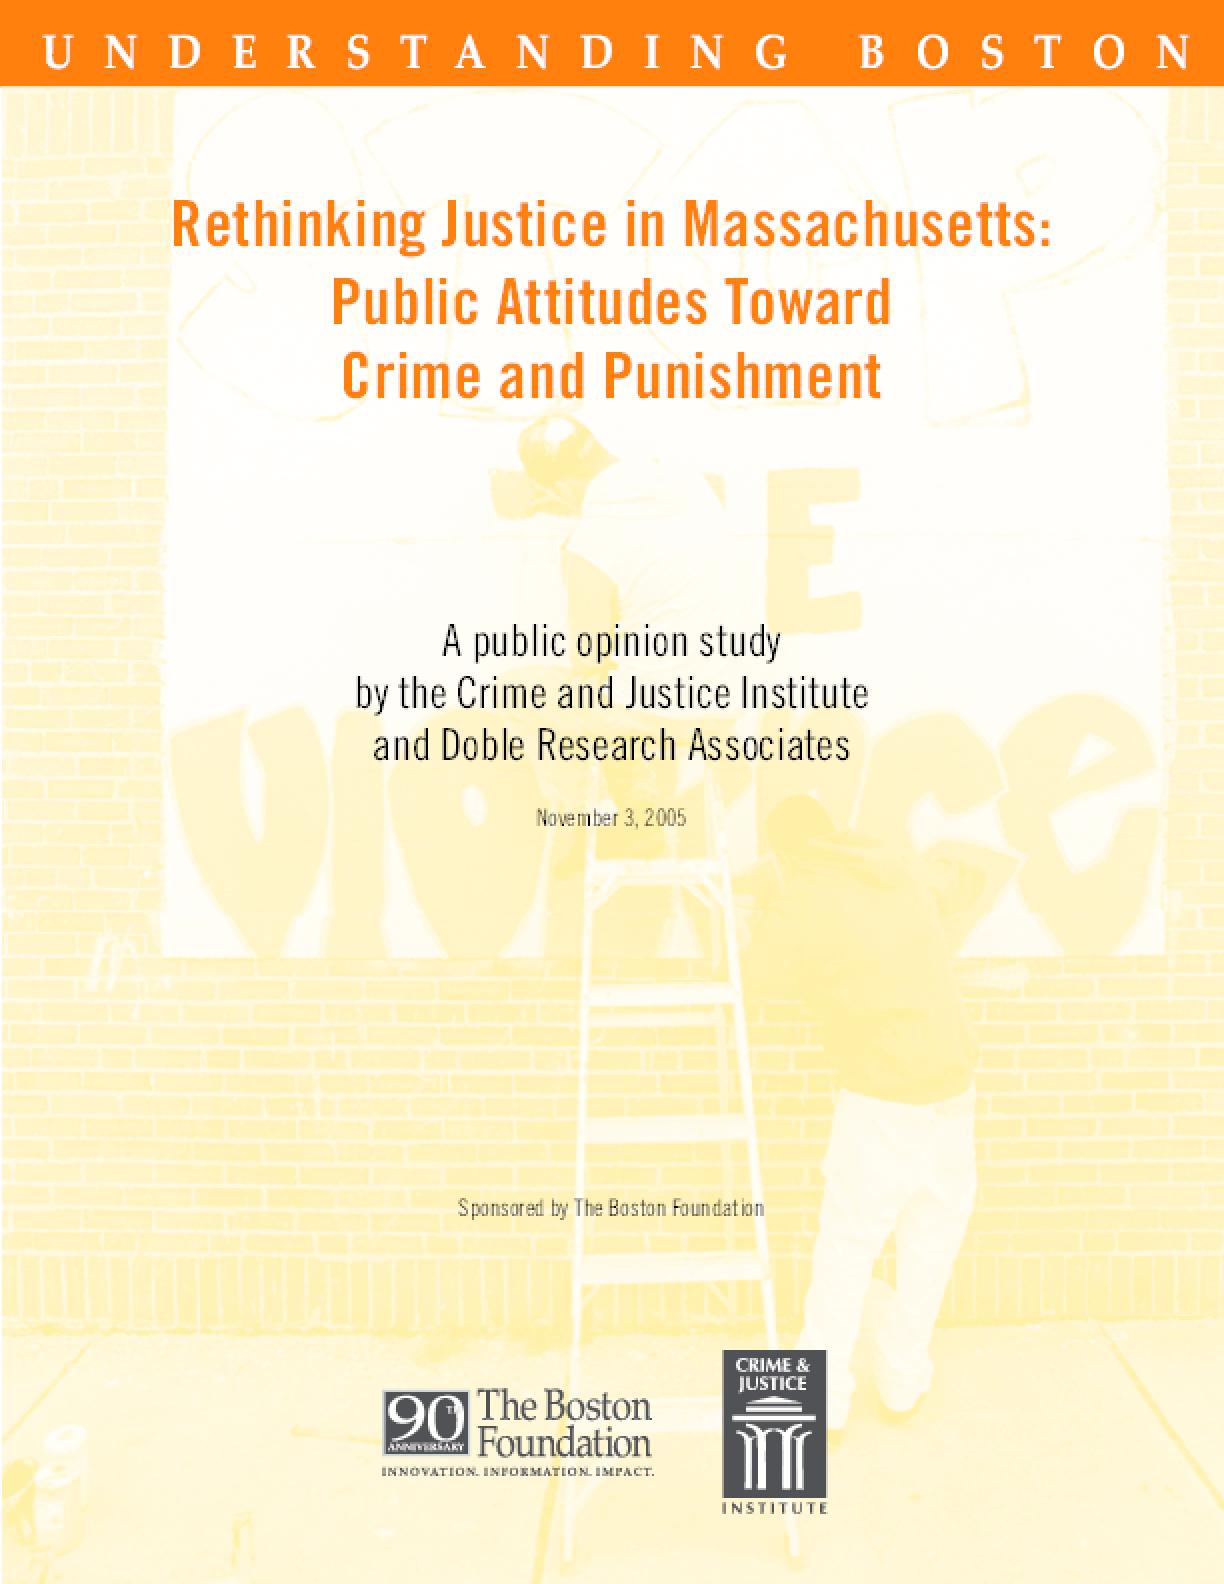 Rethinking Justice in Massachusetts: Public Attitudes Toward Crime and Punishment